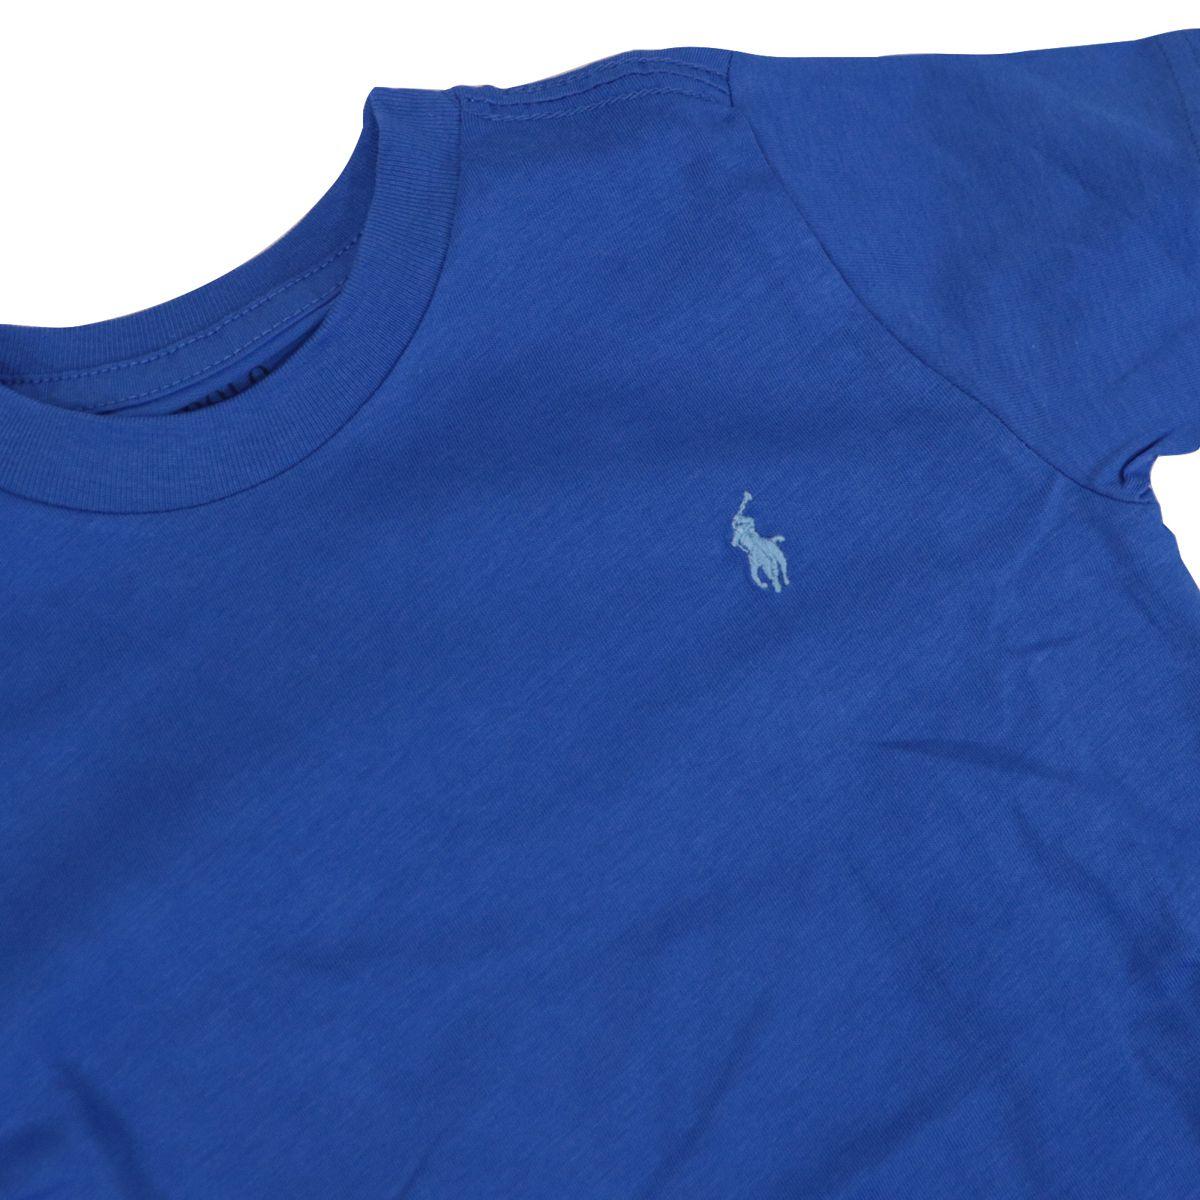 Basic cotton crew-neck t-shirt with logo Royal Polo Ralph Lauren